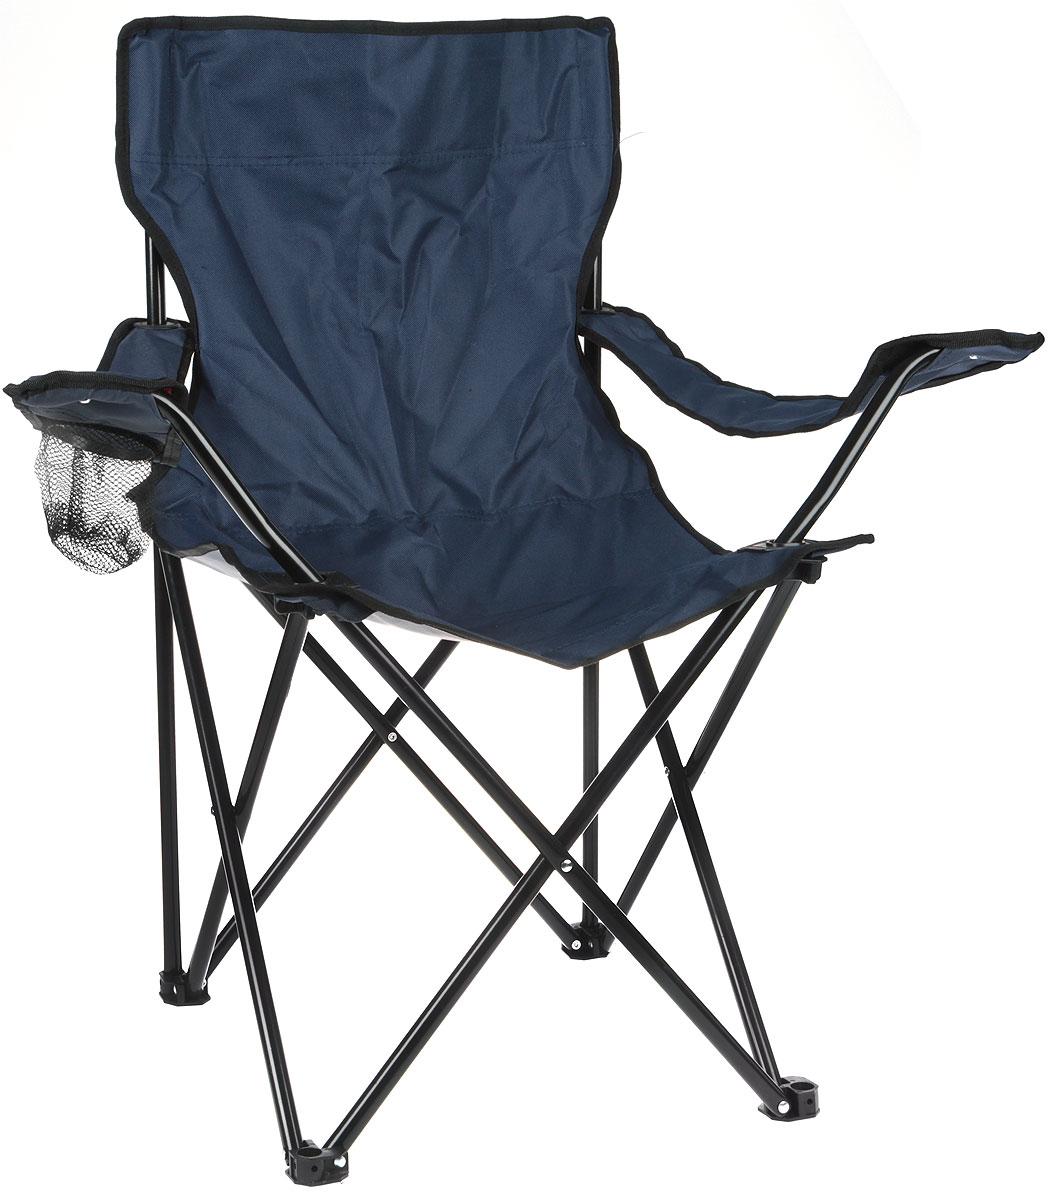 "Кресло складное ""Wildman"", с подлокотником, цвет: темно-синий, 77 х 50 х 80 см"